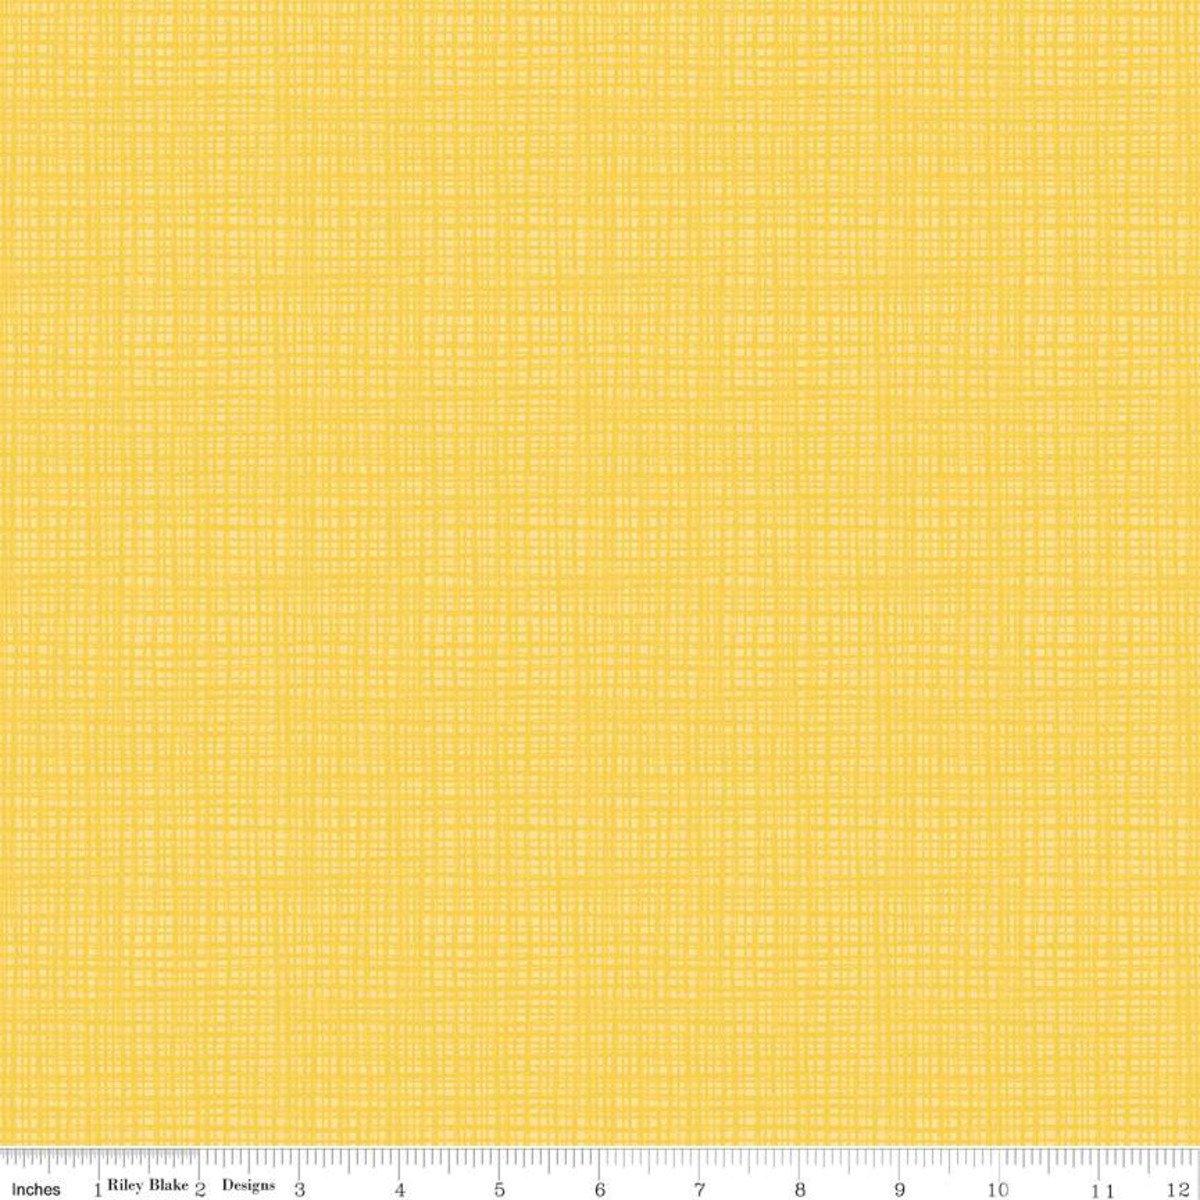 Riley Blake, Texture Basics,  YELLOW